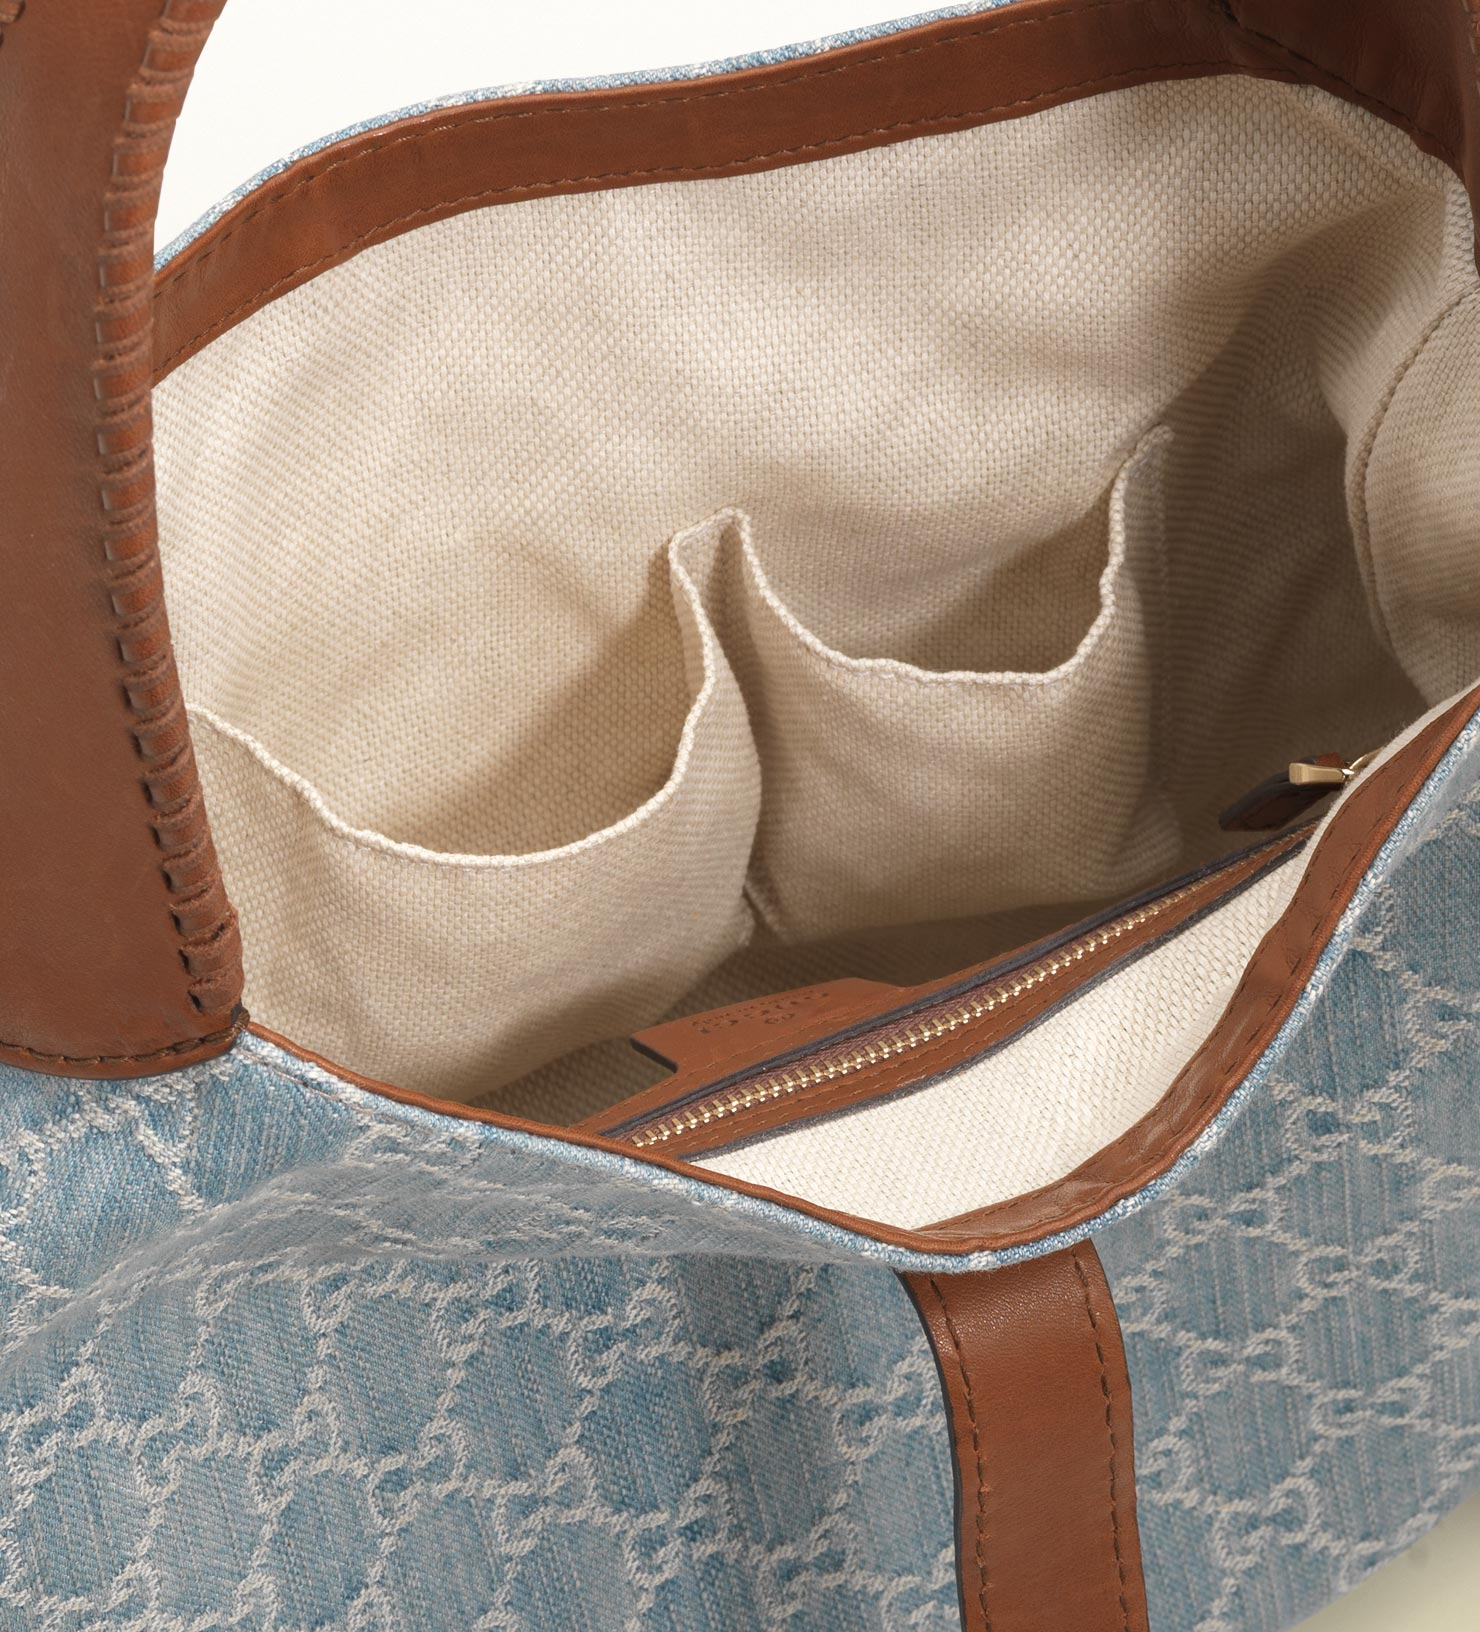 23232585f36bd Lyst - Gucci New Jackie Denim Gg Canvas Shoulder Bag in Blue